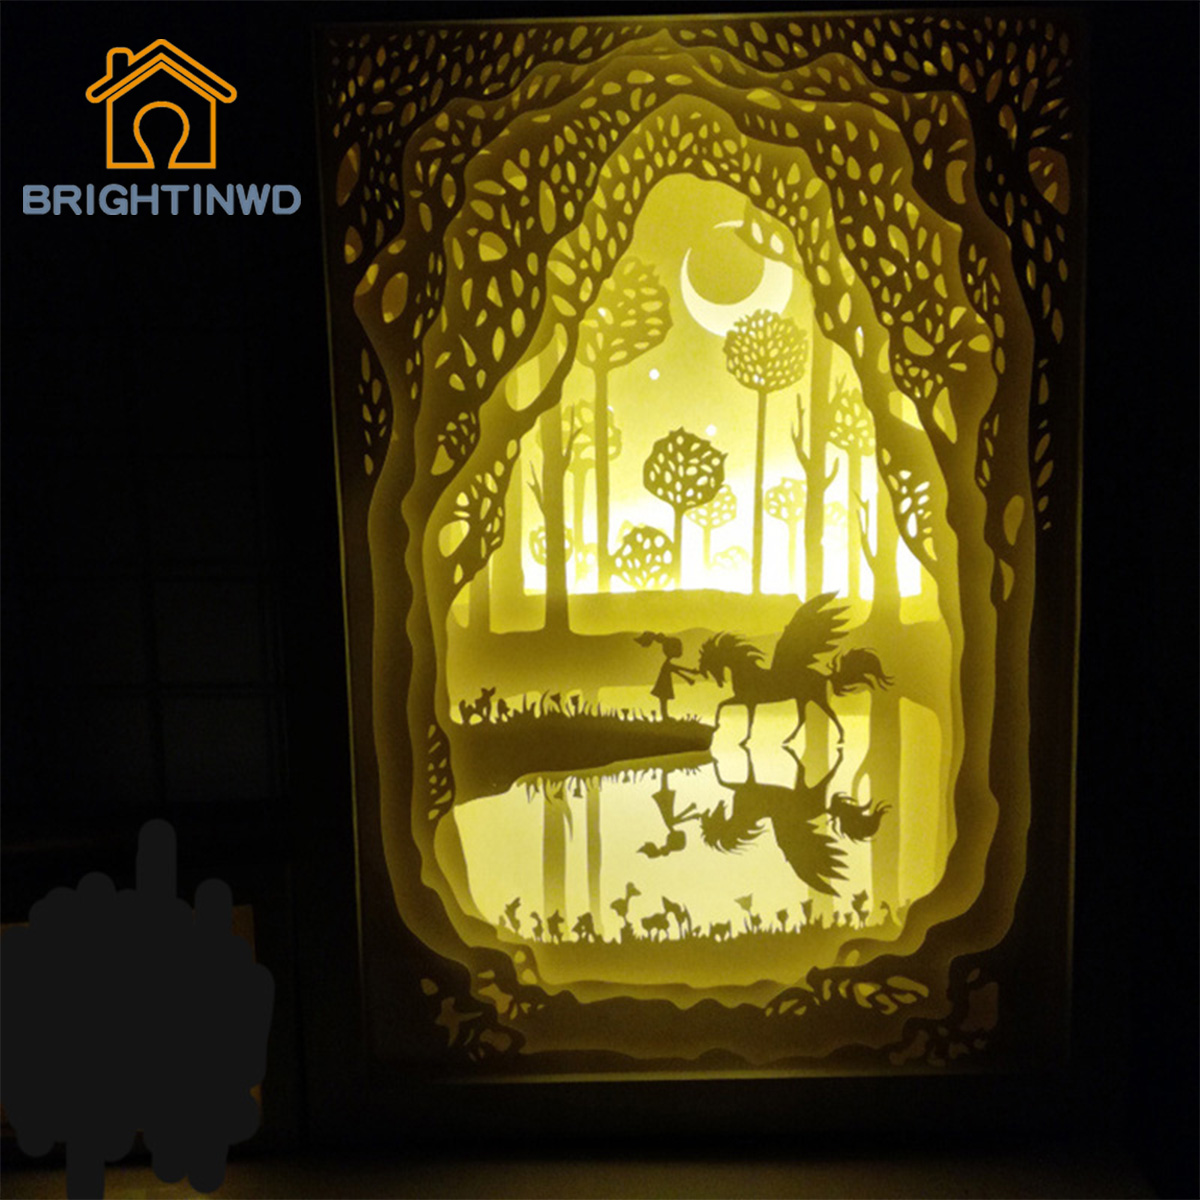 BRIGHTINWD LED Light And Shadow Paper Lamp Meet Innocence  Night Light Personalized Gifts декоративні лампи із дерева у стилі бра